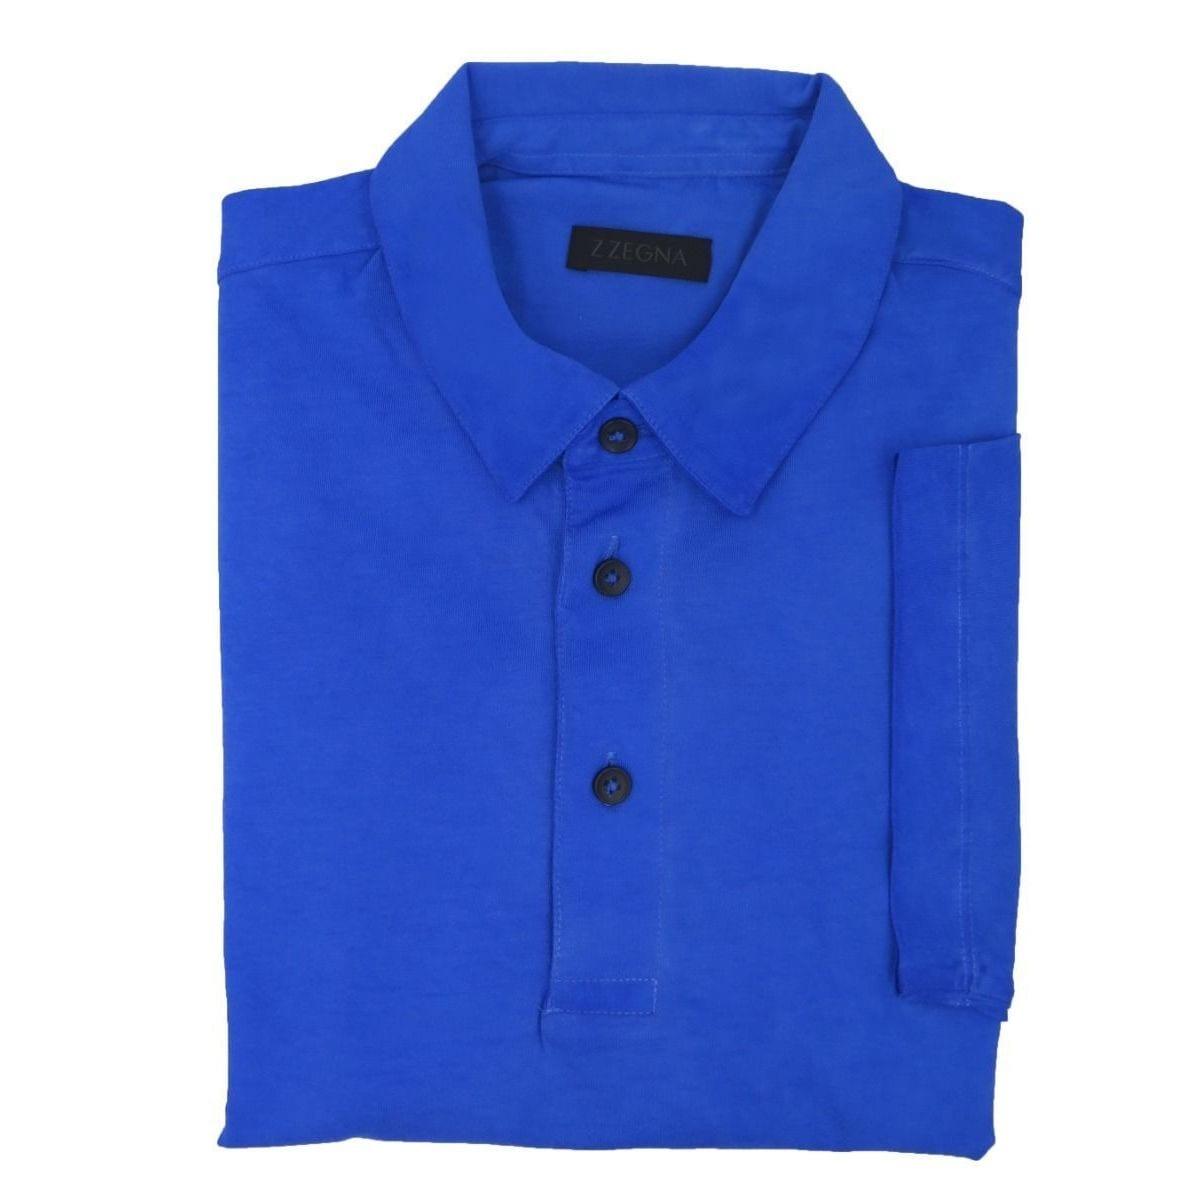 dbafa3b13 Shop Z Zegna Disressed Blue Polo T-shirt - On Sale - Free Shipping Today -  Overstock.com - 15649115